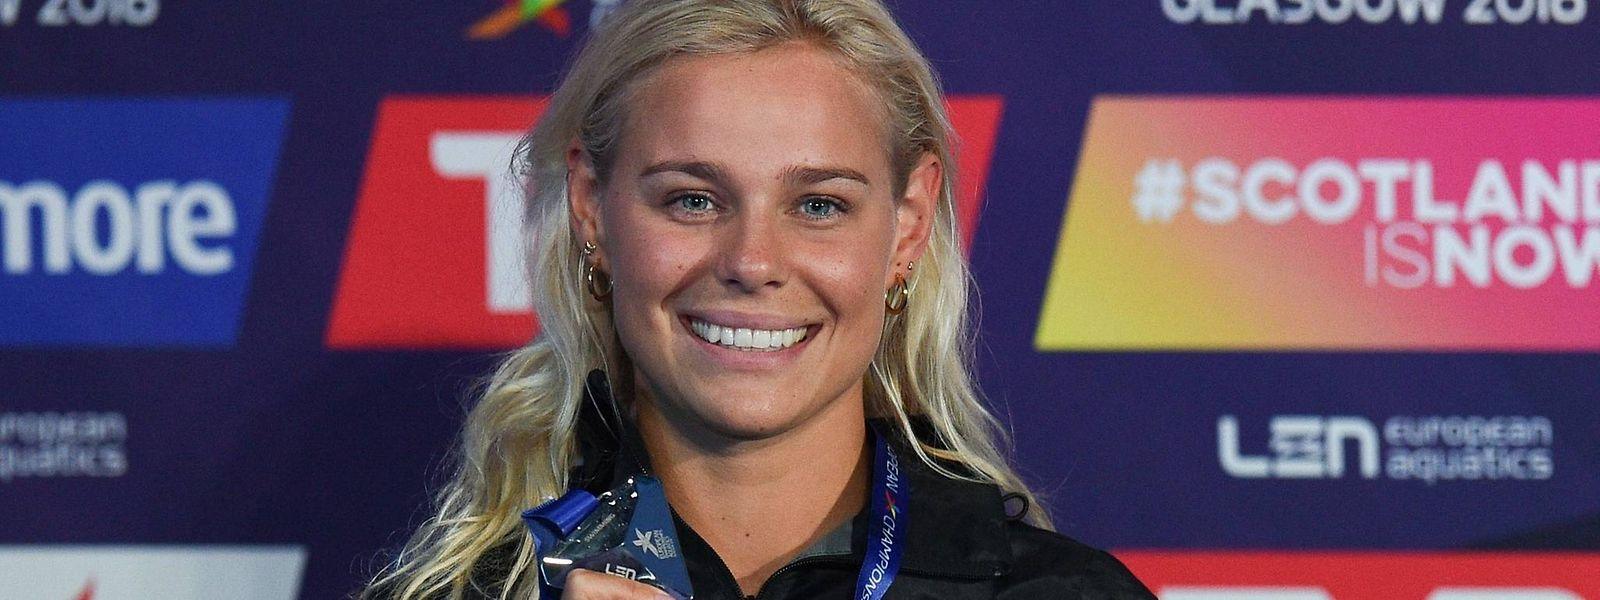 Pernille Blume kommt als Olympiasiegerin nach Luxemburg.